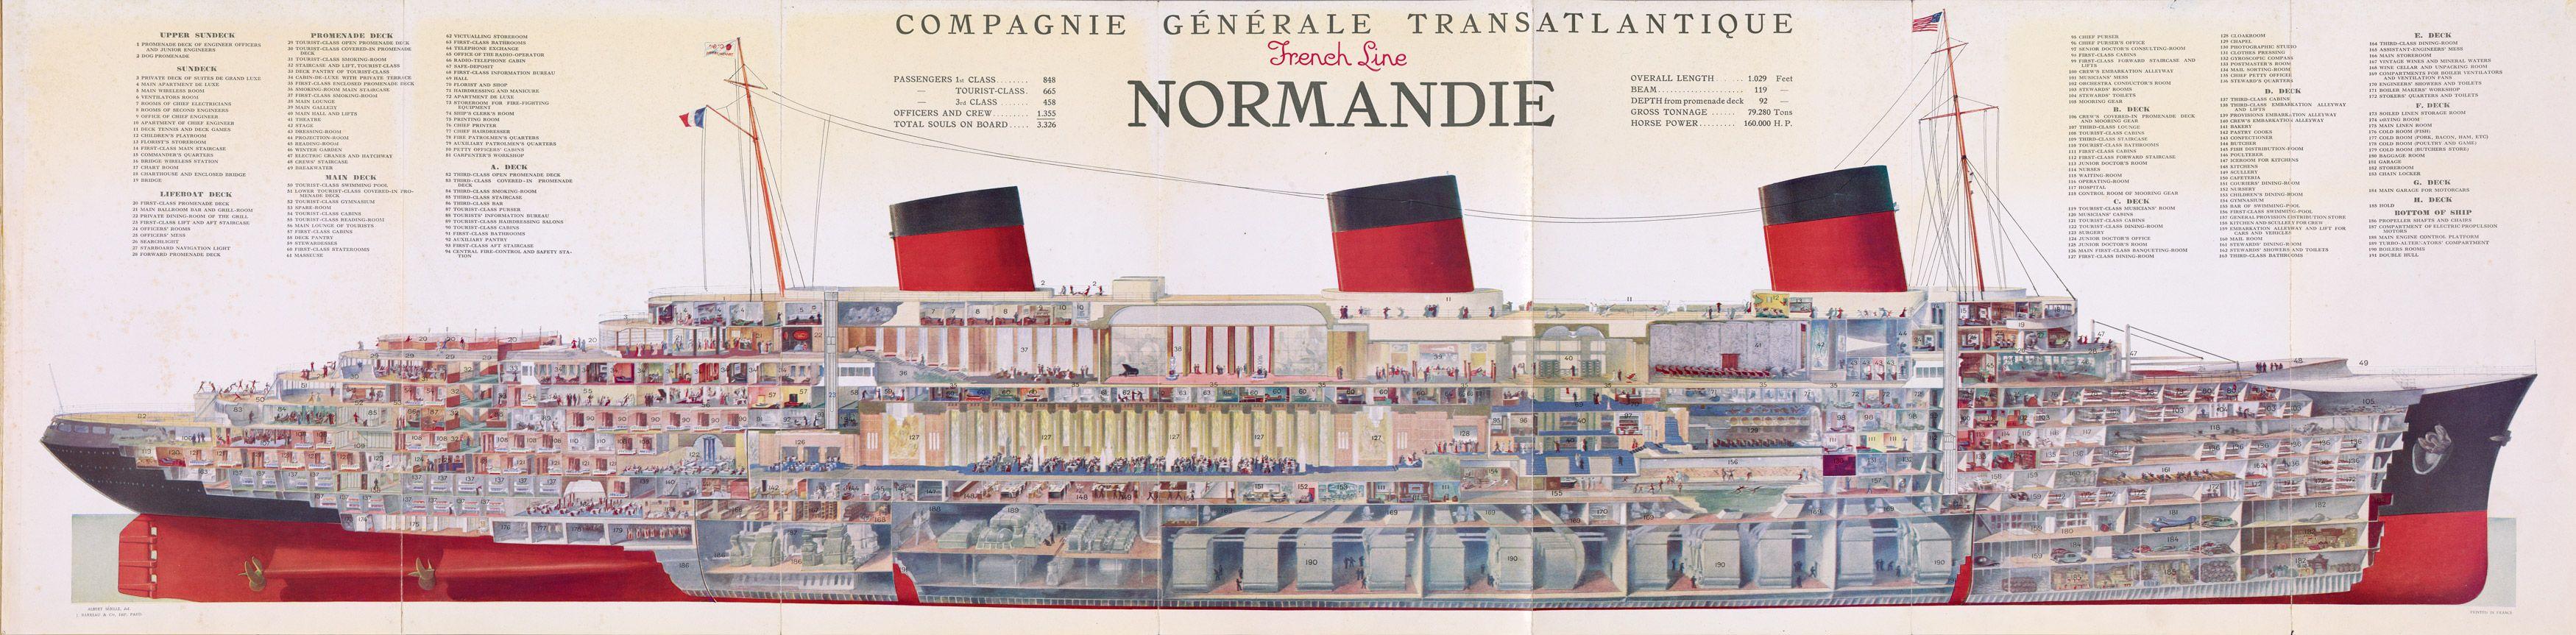 Amazing Steamship Cutaway Drawings Infographics